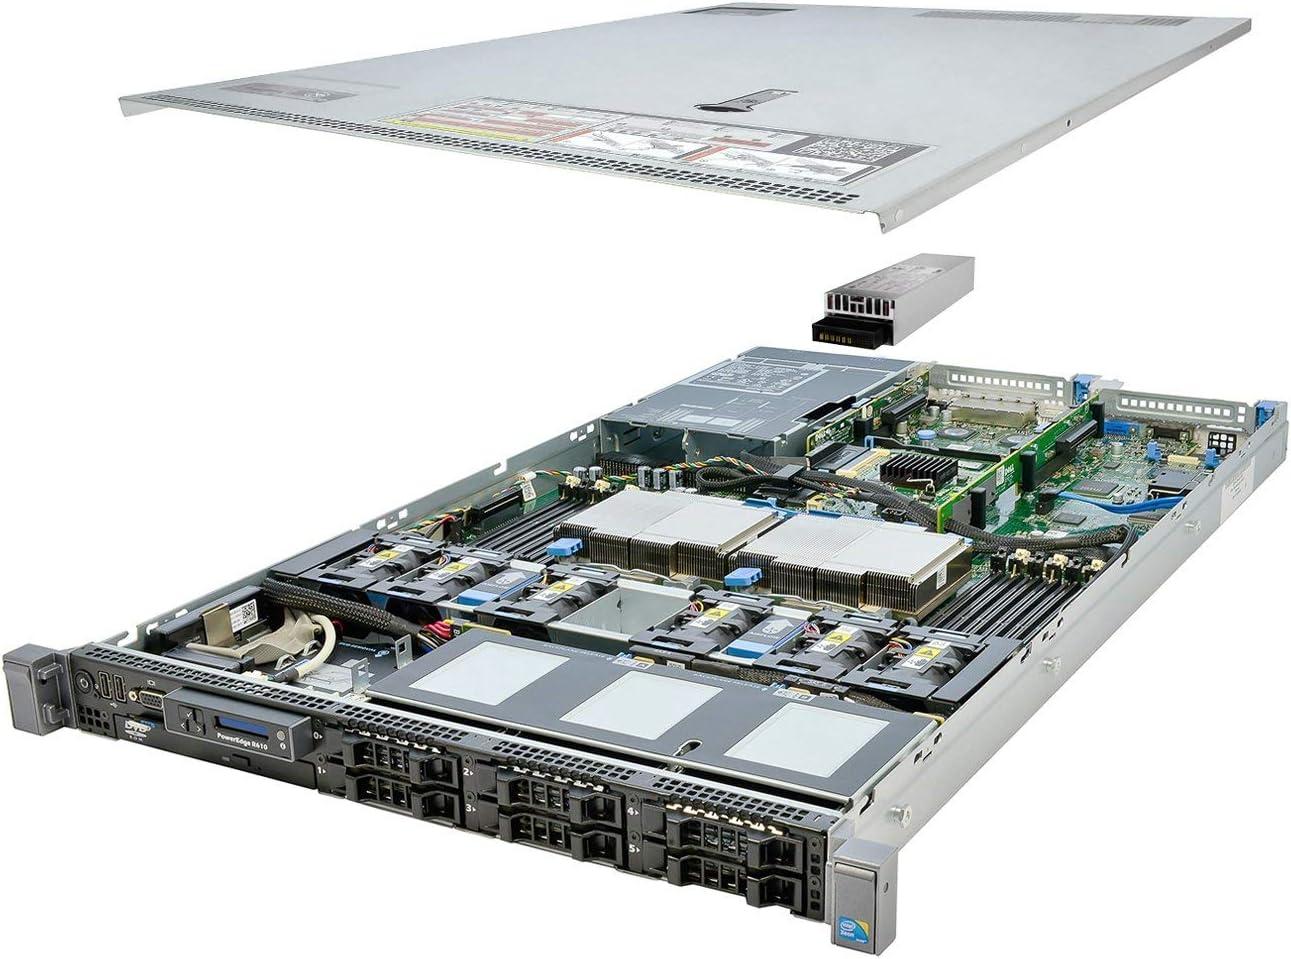 Premium Dell PowerEdge R610 Server 2x 3.33Ghz X5680 6C 48GB (Renewed)